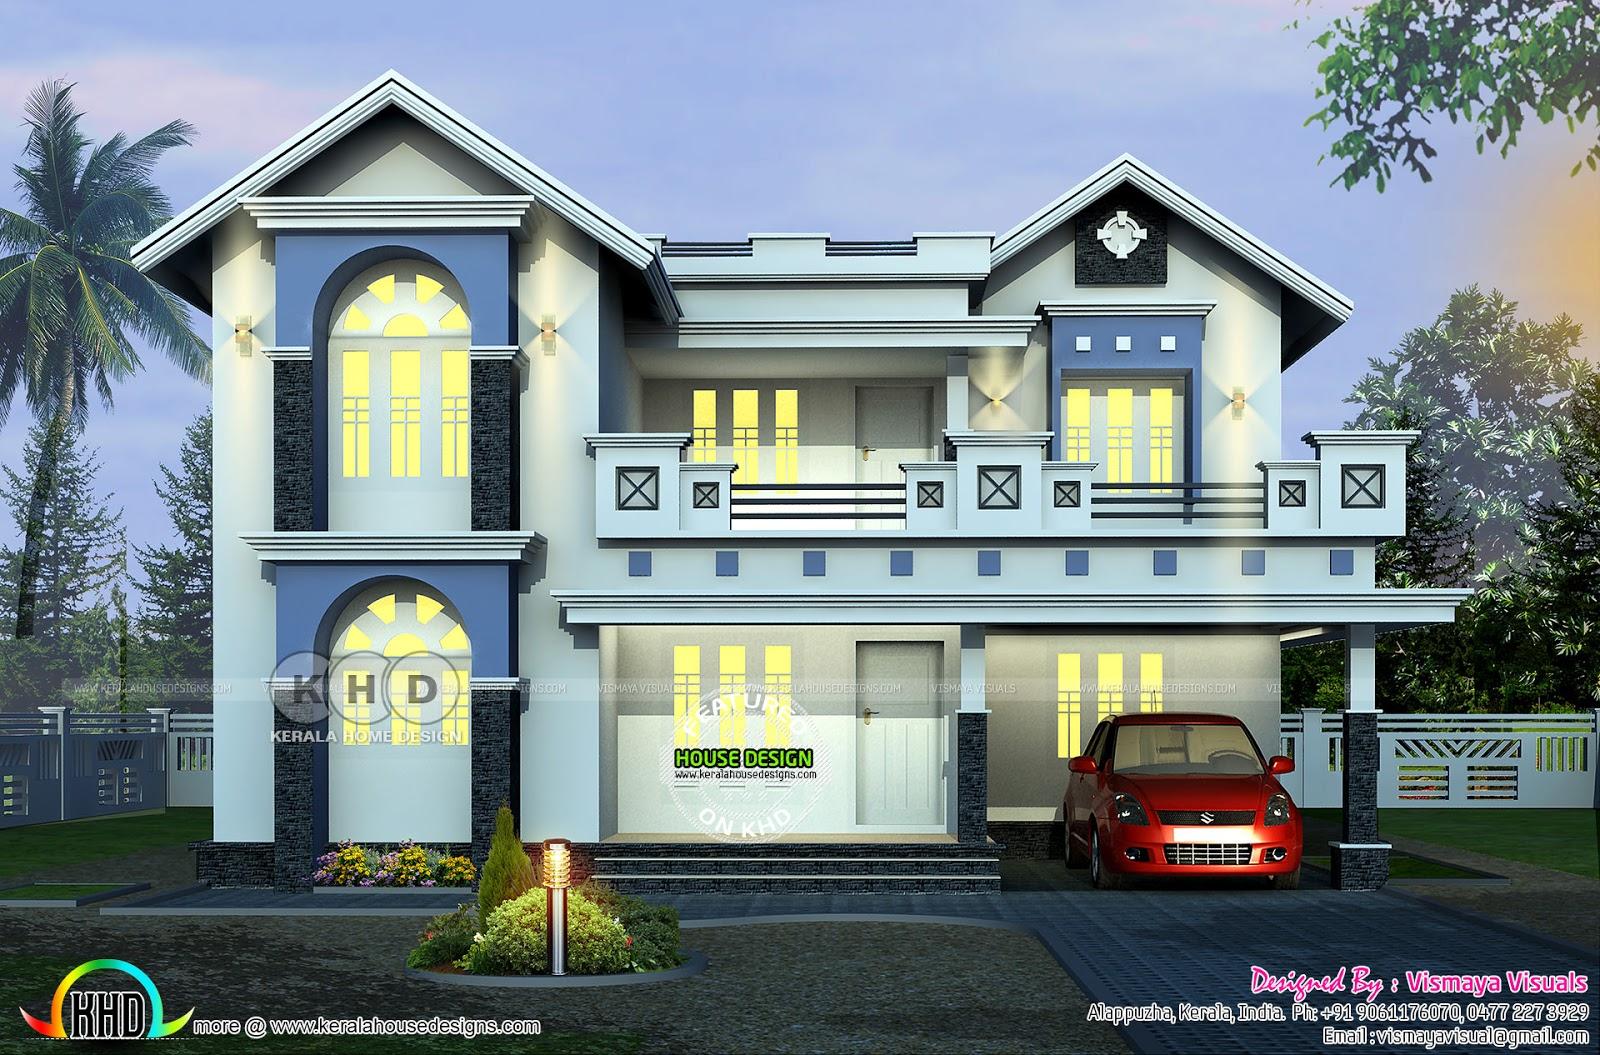 2401 Square Feet, 3 Bedroom Decorative Home Plan